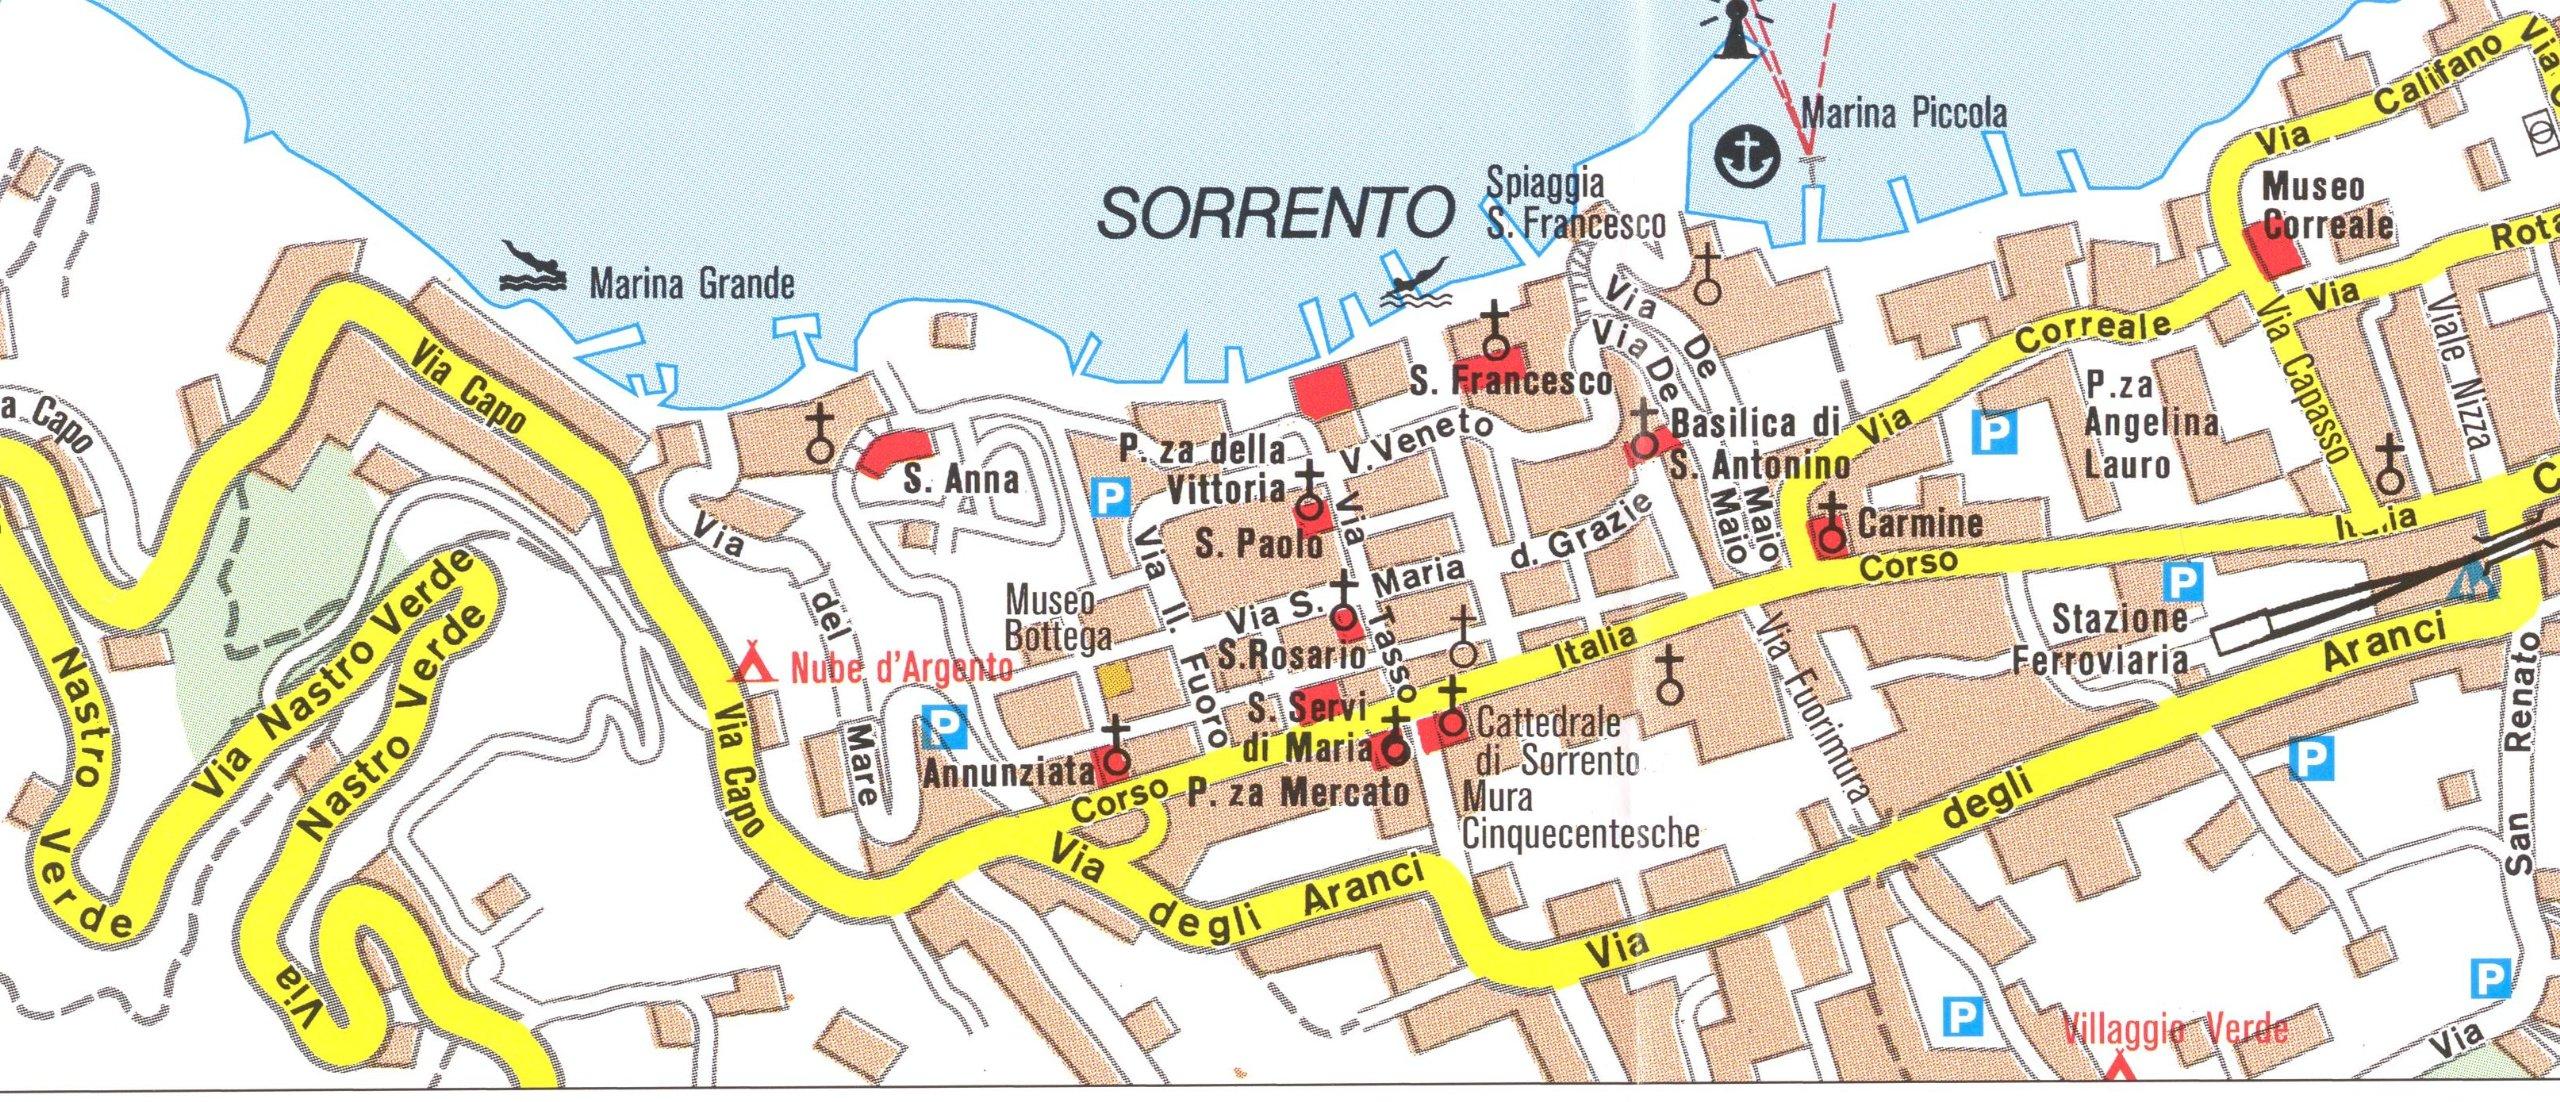 Map Of Sorrento Sorrento Peninsula   Amalfi Coast hiking map & guide 1:50.000